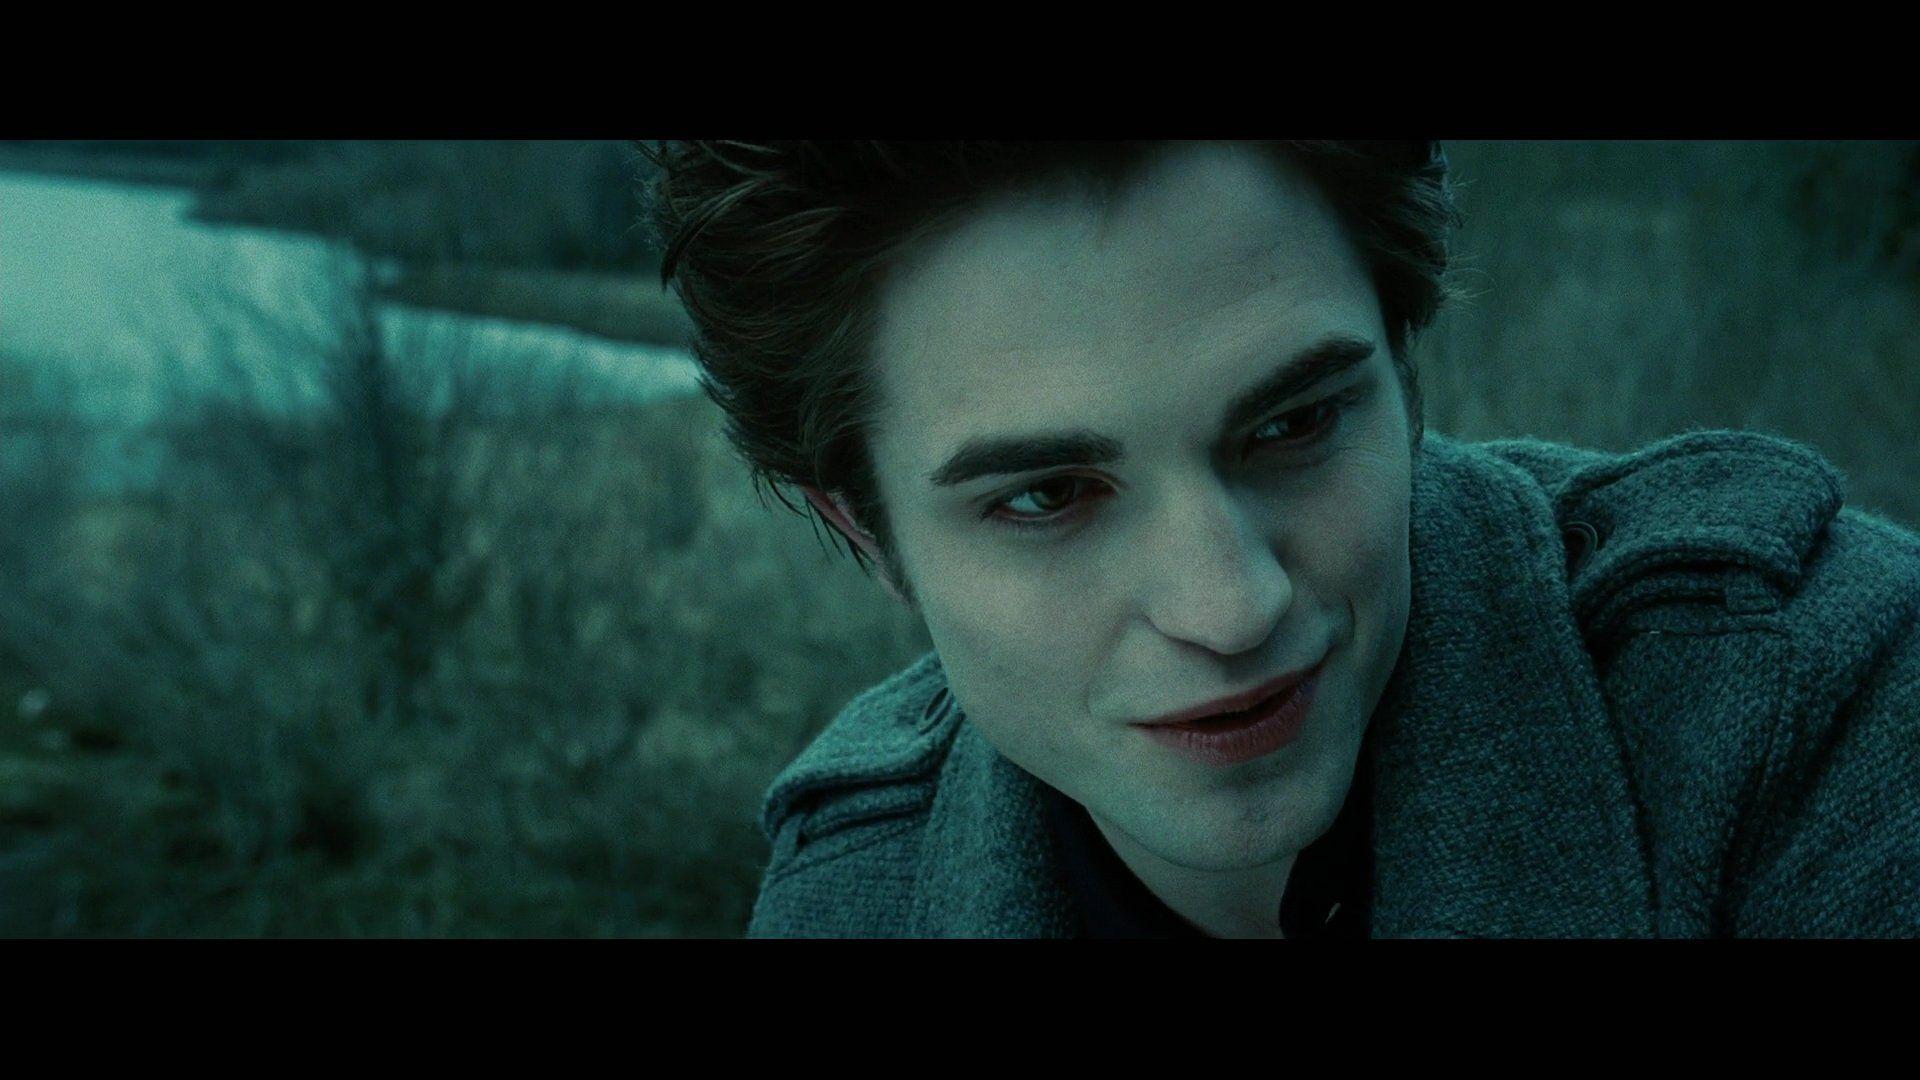 Pin By Amanda On Twilight Screencaps Twilight Pictures Twilight Fans Twilight